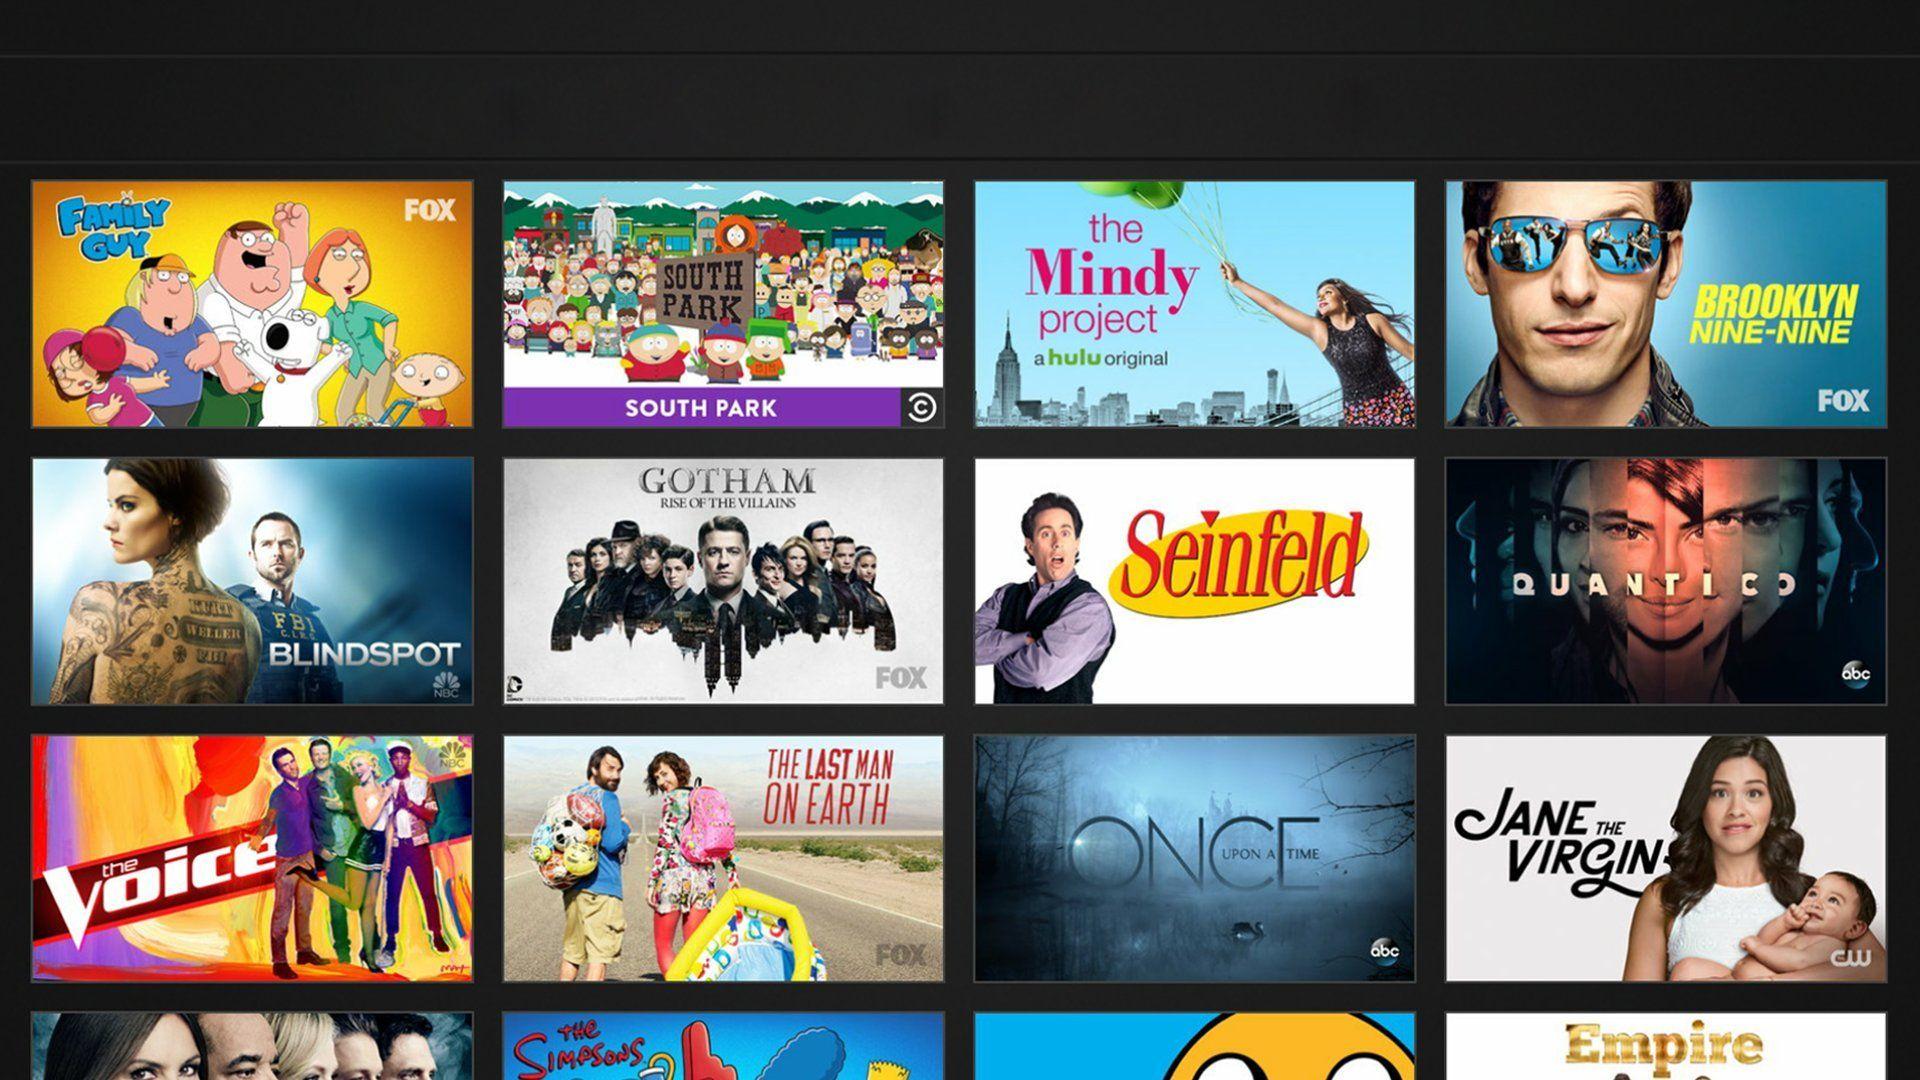 Hulu Live And On Demand Tv Movies Originals More The Originals Movies Blindspot